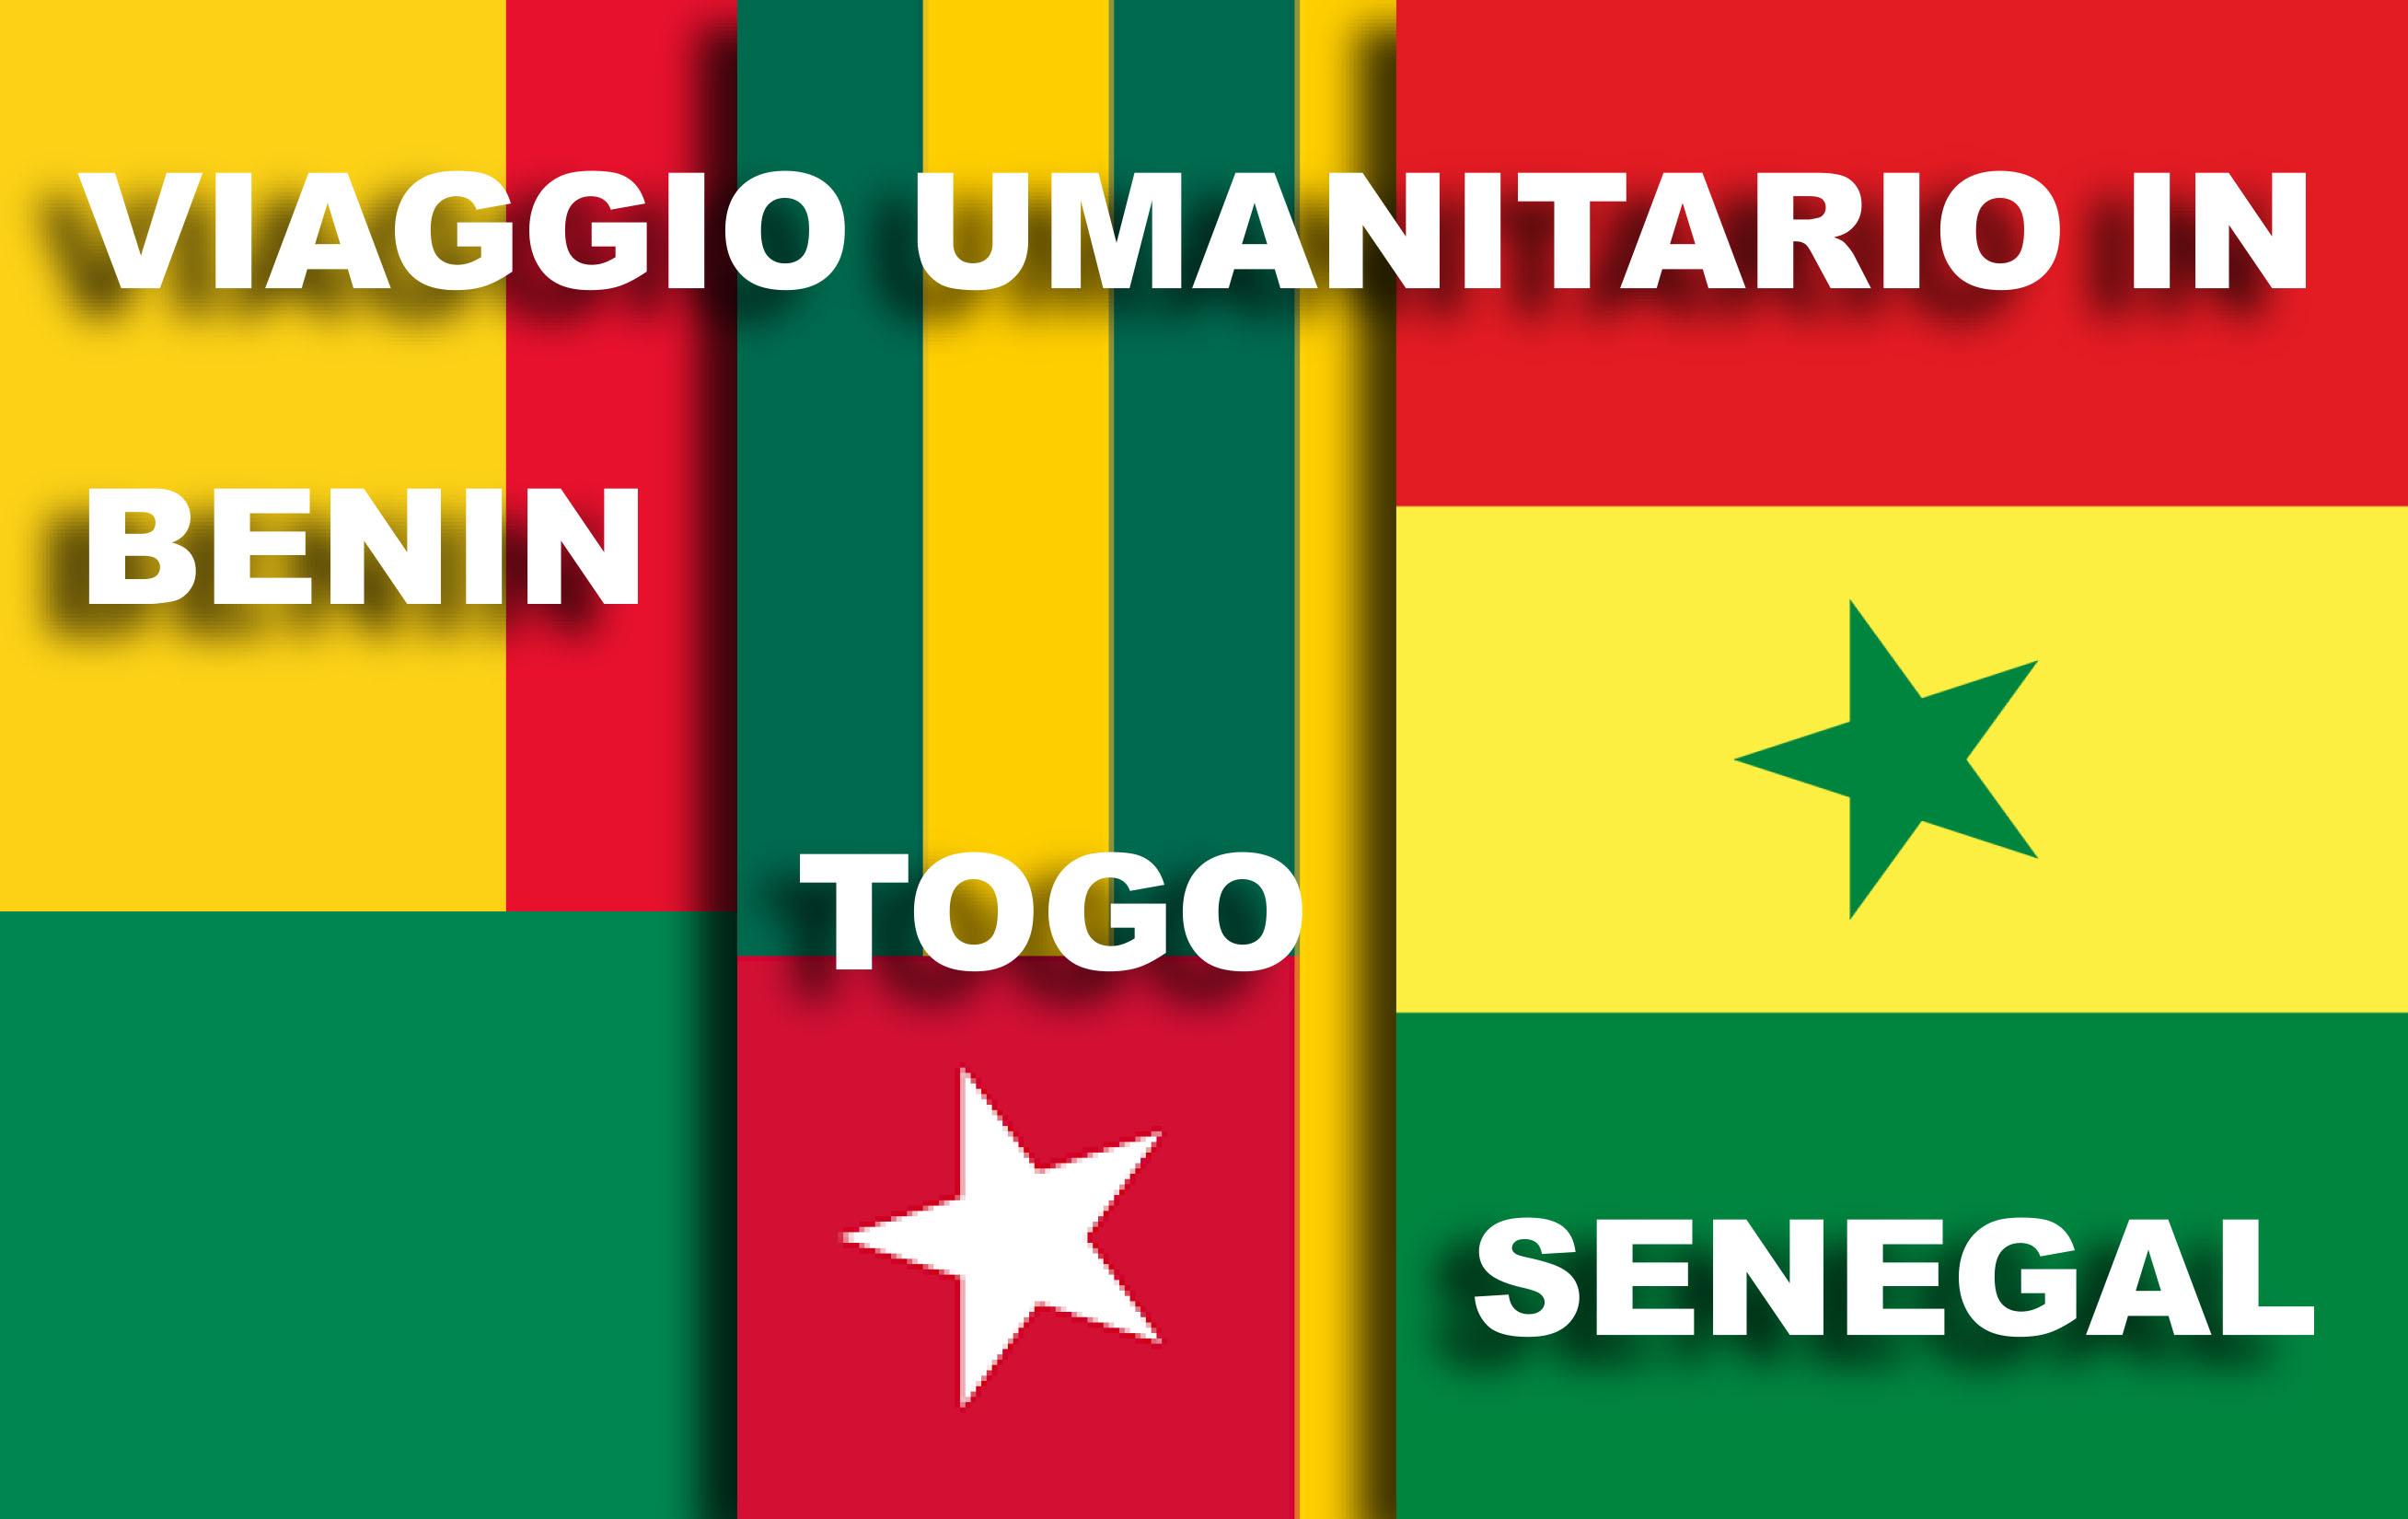 Viaggio Umanitario in Benin, Togo e Senegal